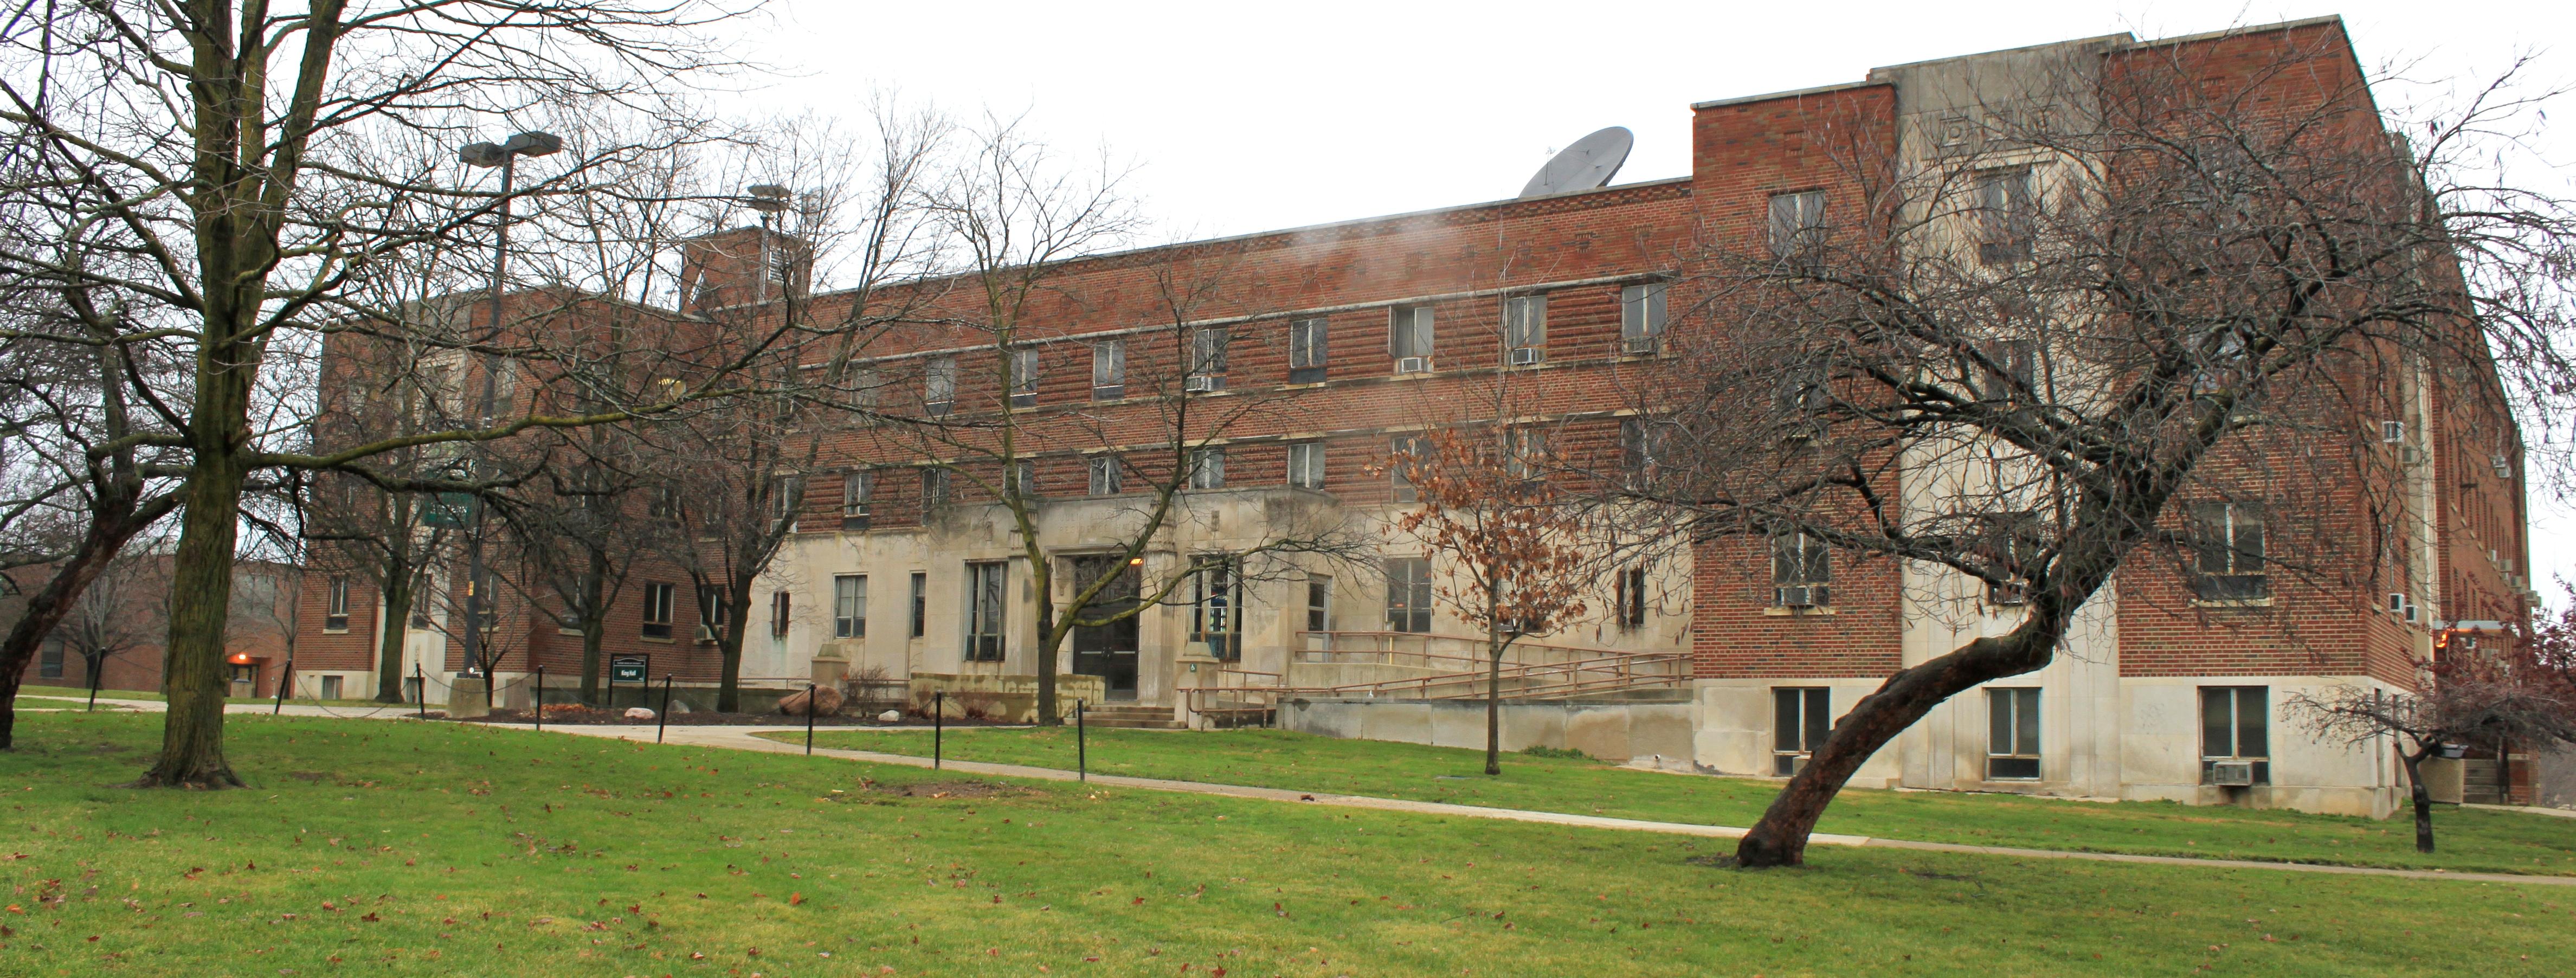 File:King Hall Eastern Michigan University Campus ...